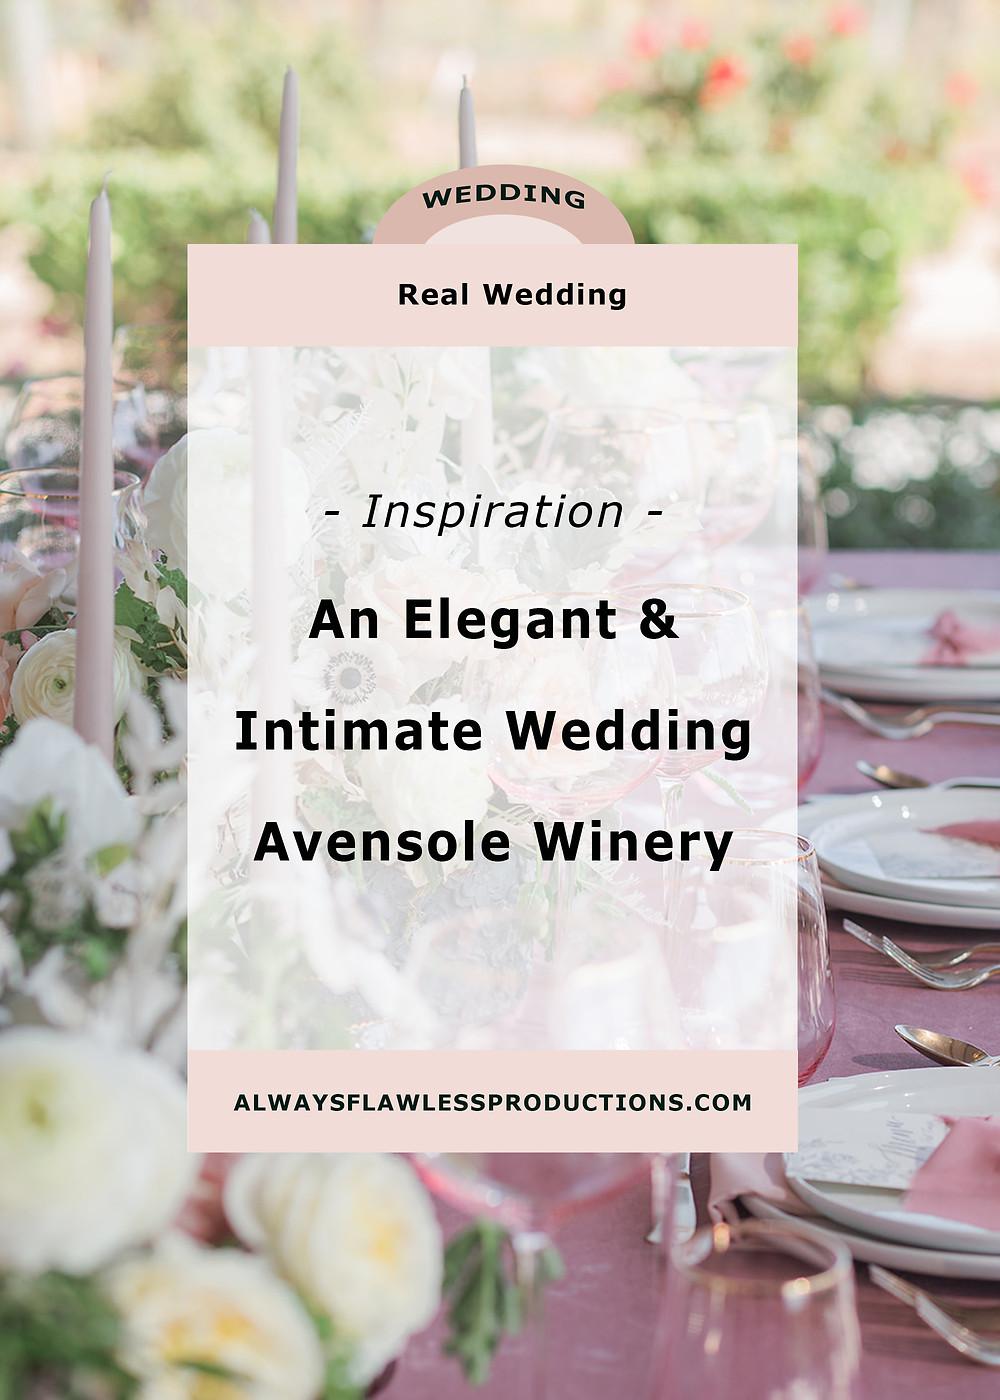 Avensole Winery wedding planning